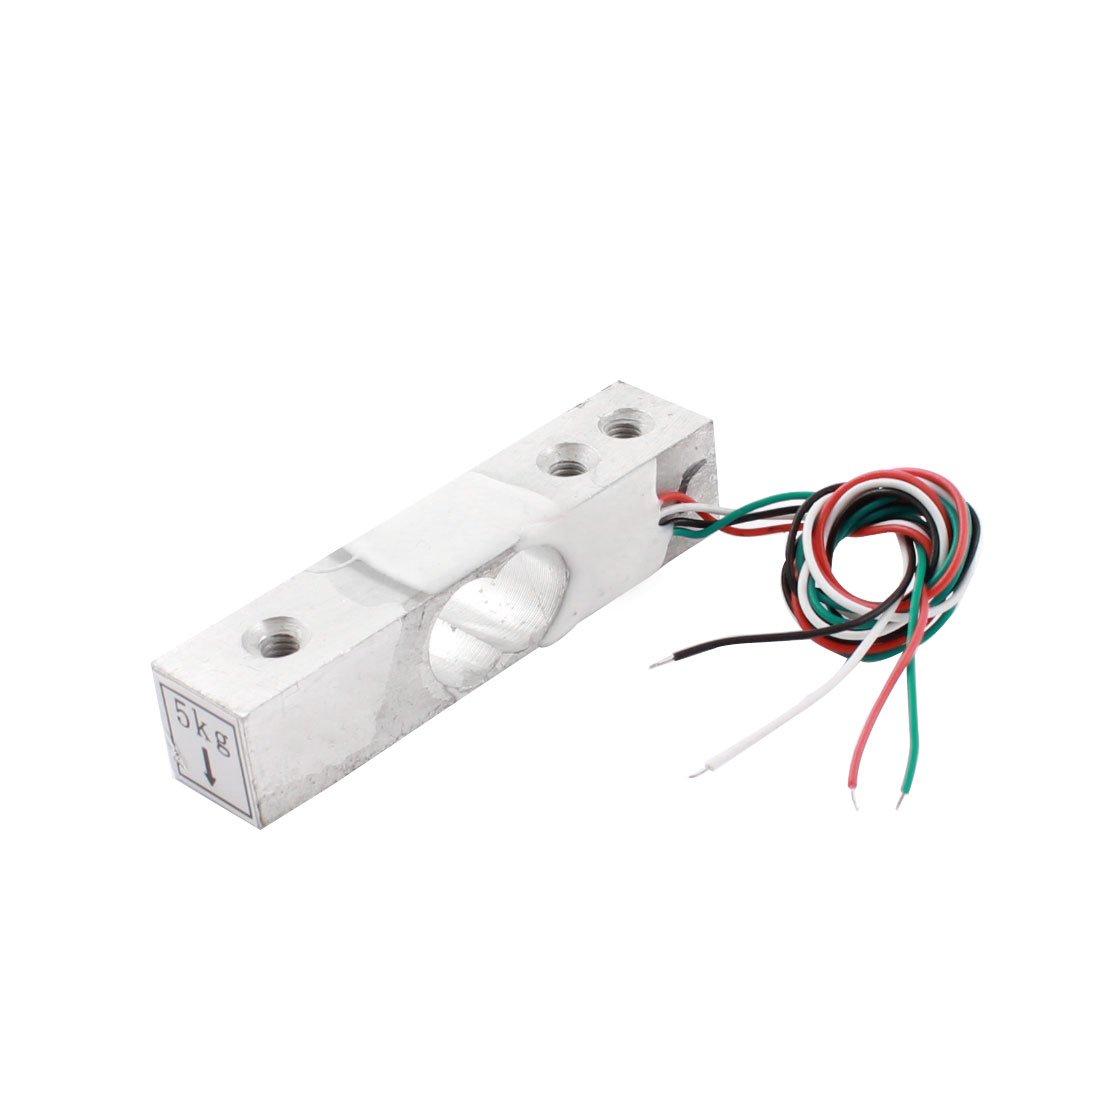 Aexit 5Kg Rectangle Aluminium Alloy Mini Load Cell Weighting Pressure Sensor